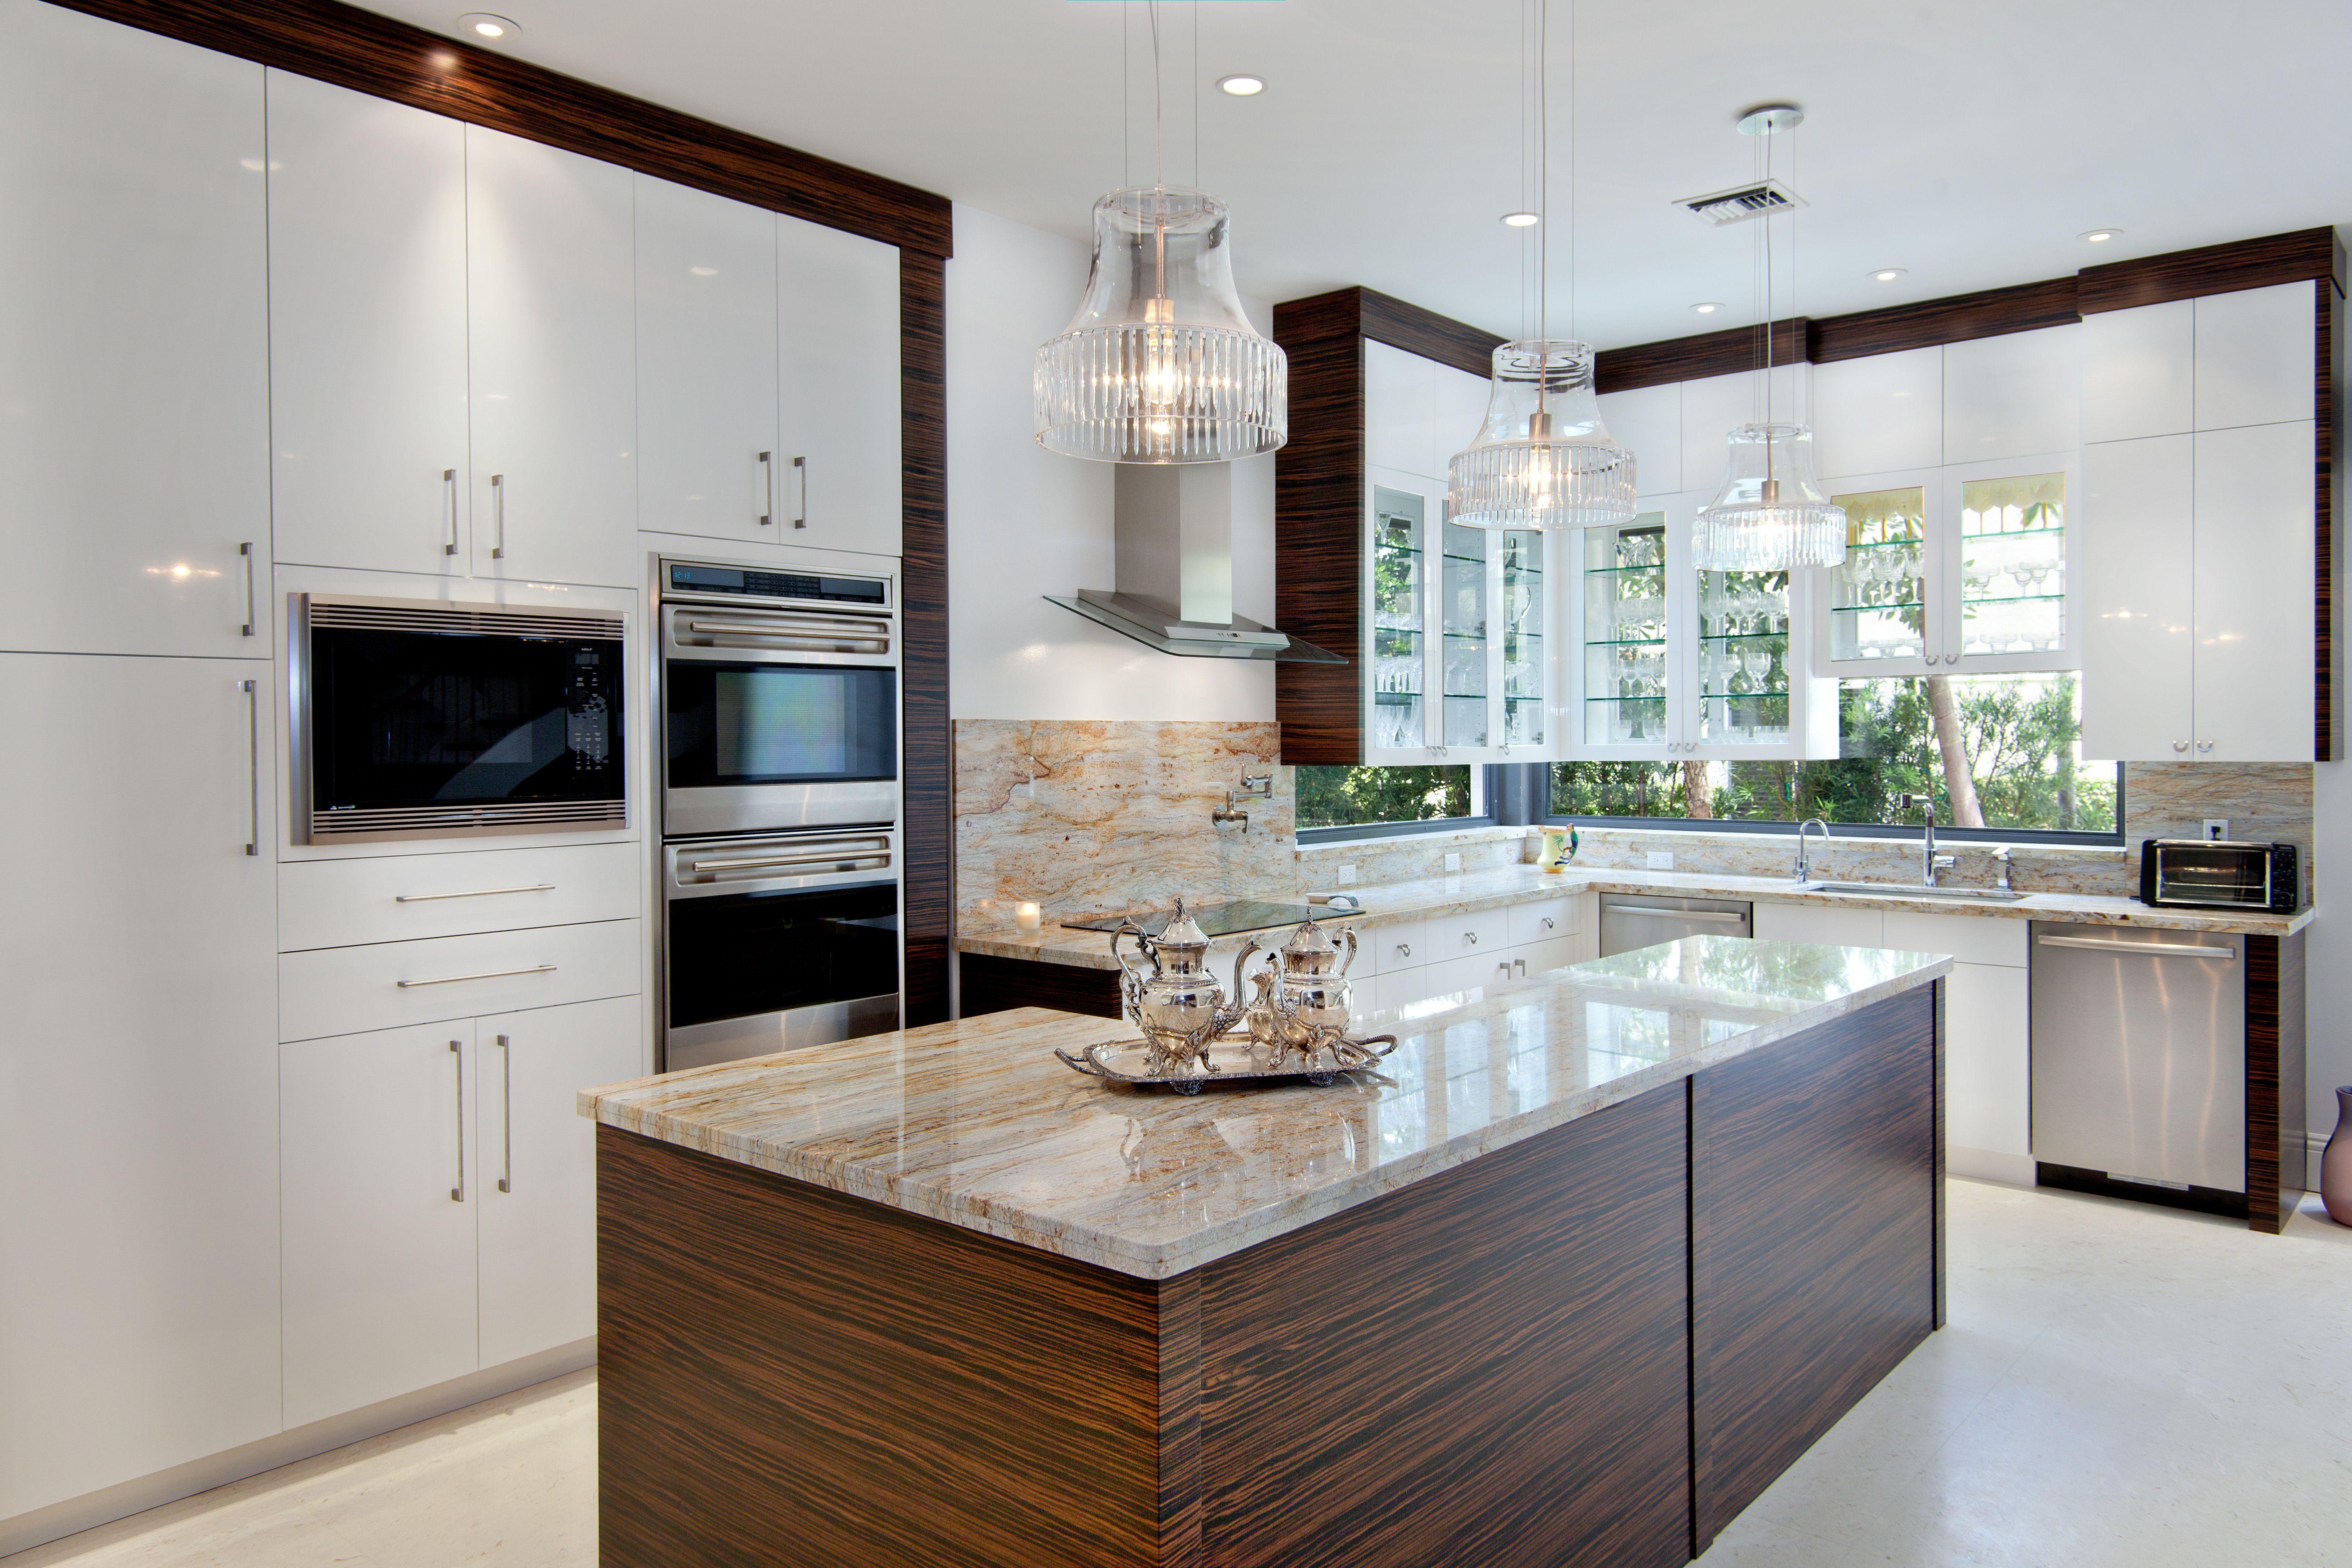 Pin By Grand Cabinet Co On Decor Ideas Kitchen Interior Countertops Contemporary Kitchen